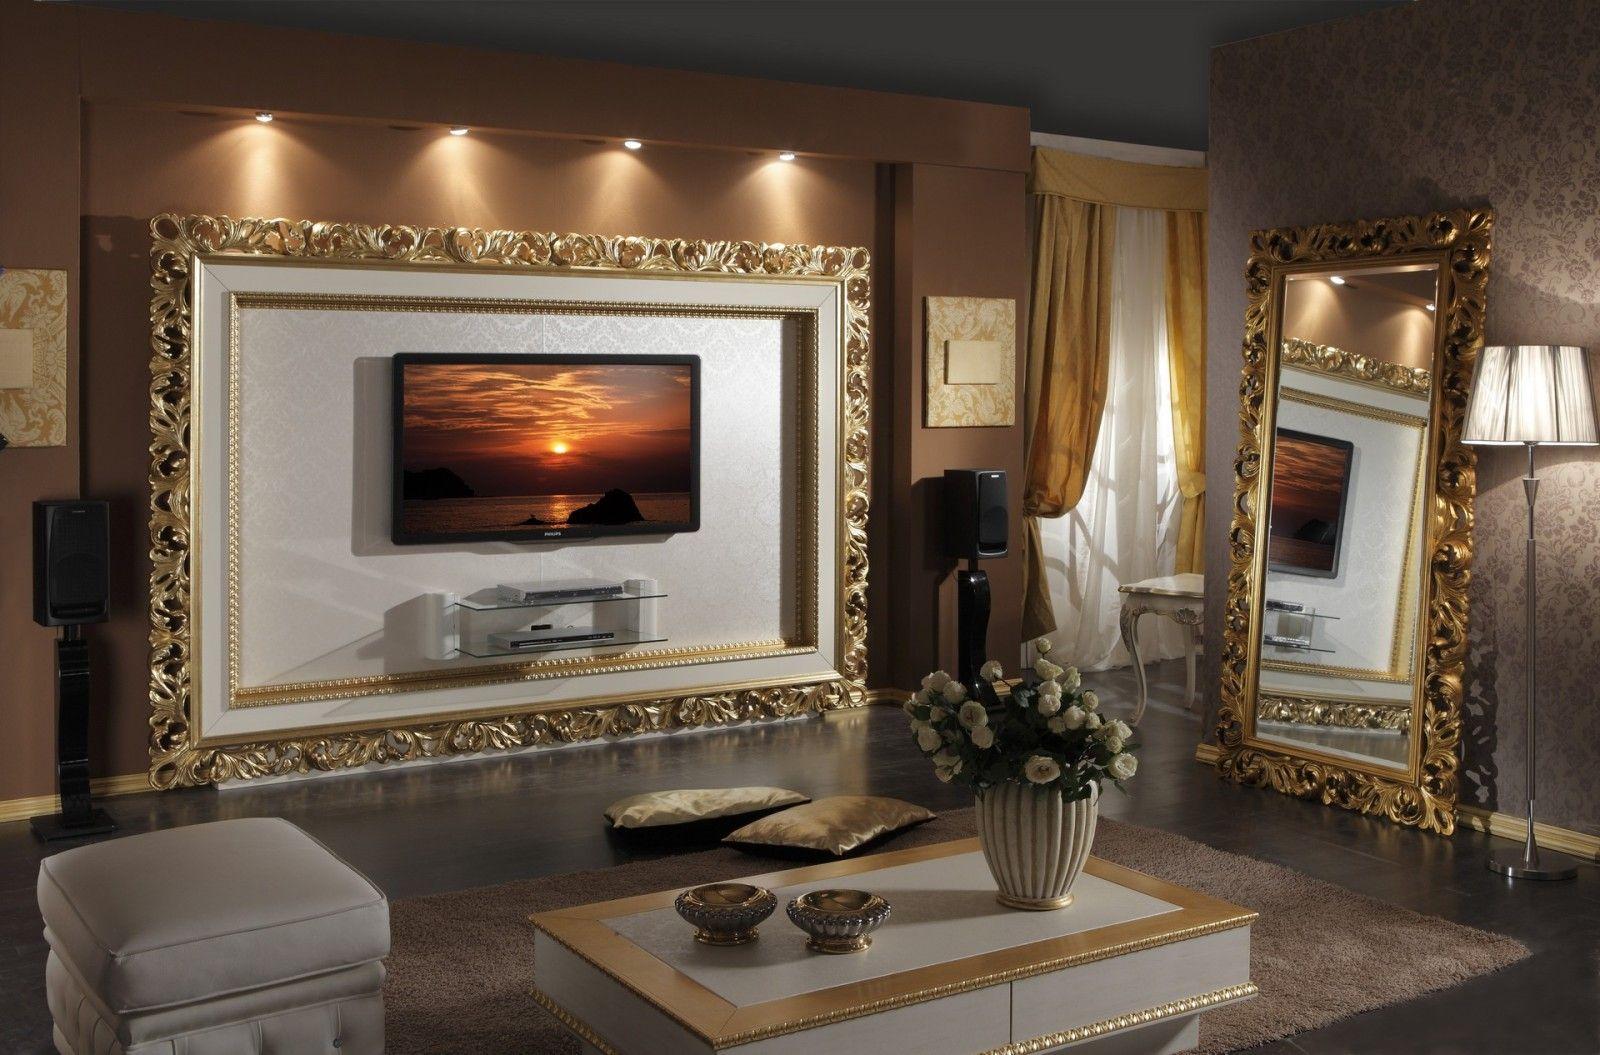 Centro De Entretenimiento Living Room Collections Home Wholesale Furniture